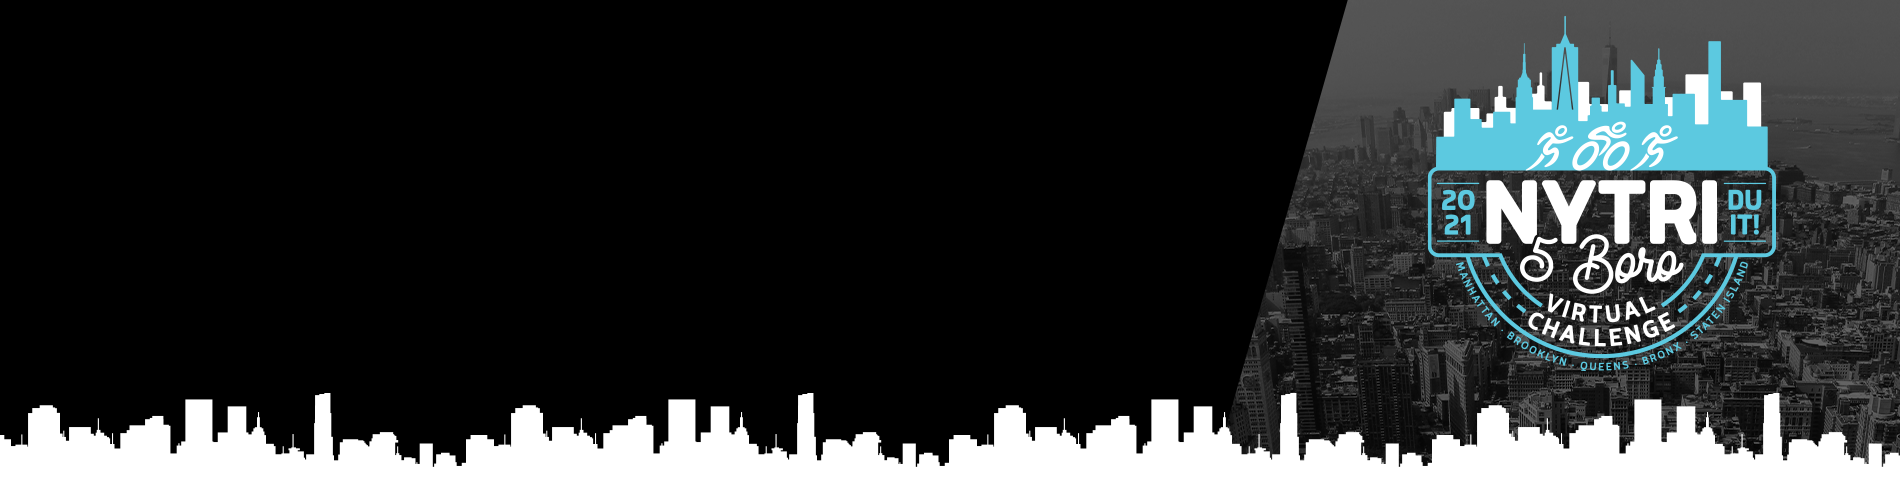 NYTriathlon - 5boro virtual challenge logo - NYC in the background